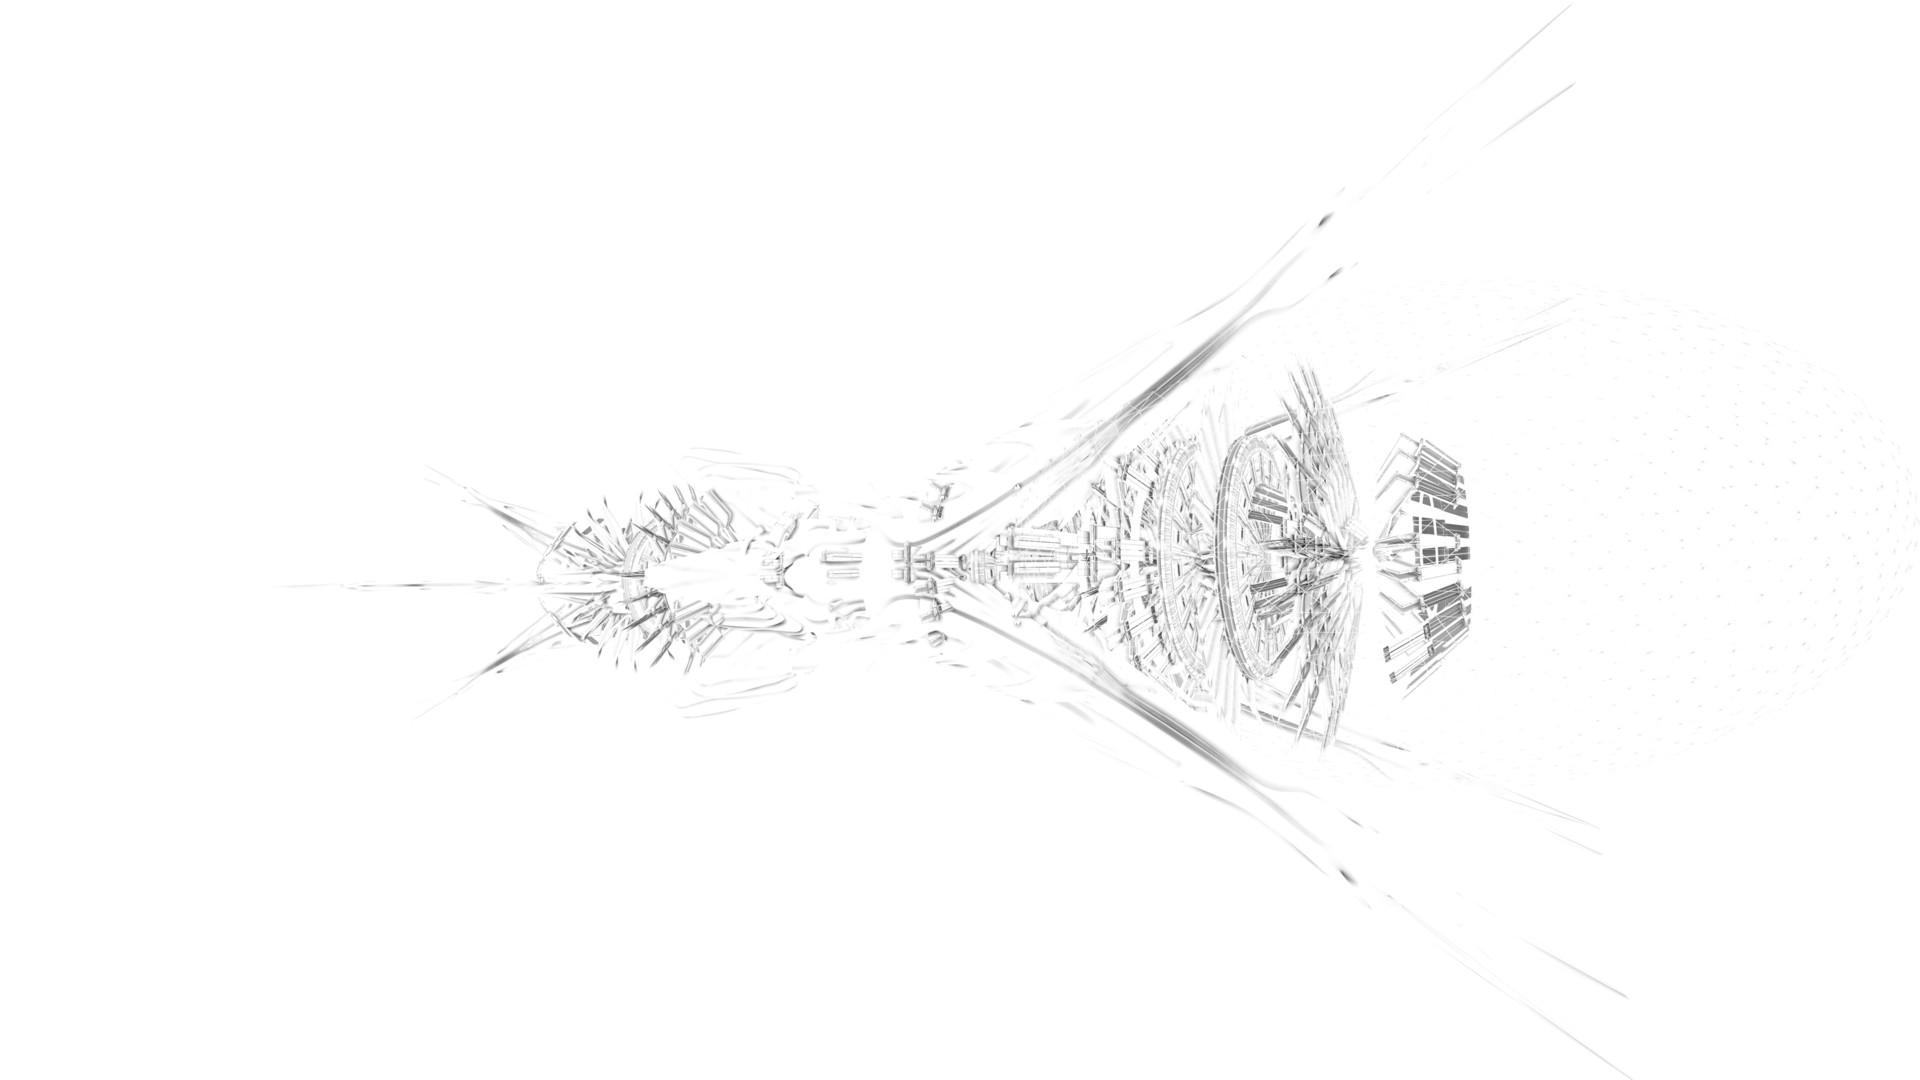 Kresimir jelusic robob3ar 239 0706 laser spewer ao